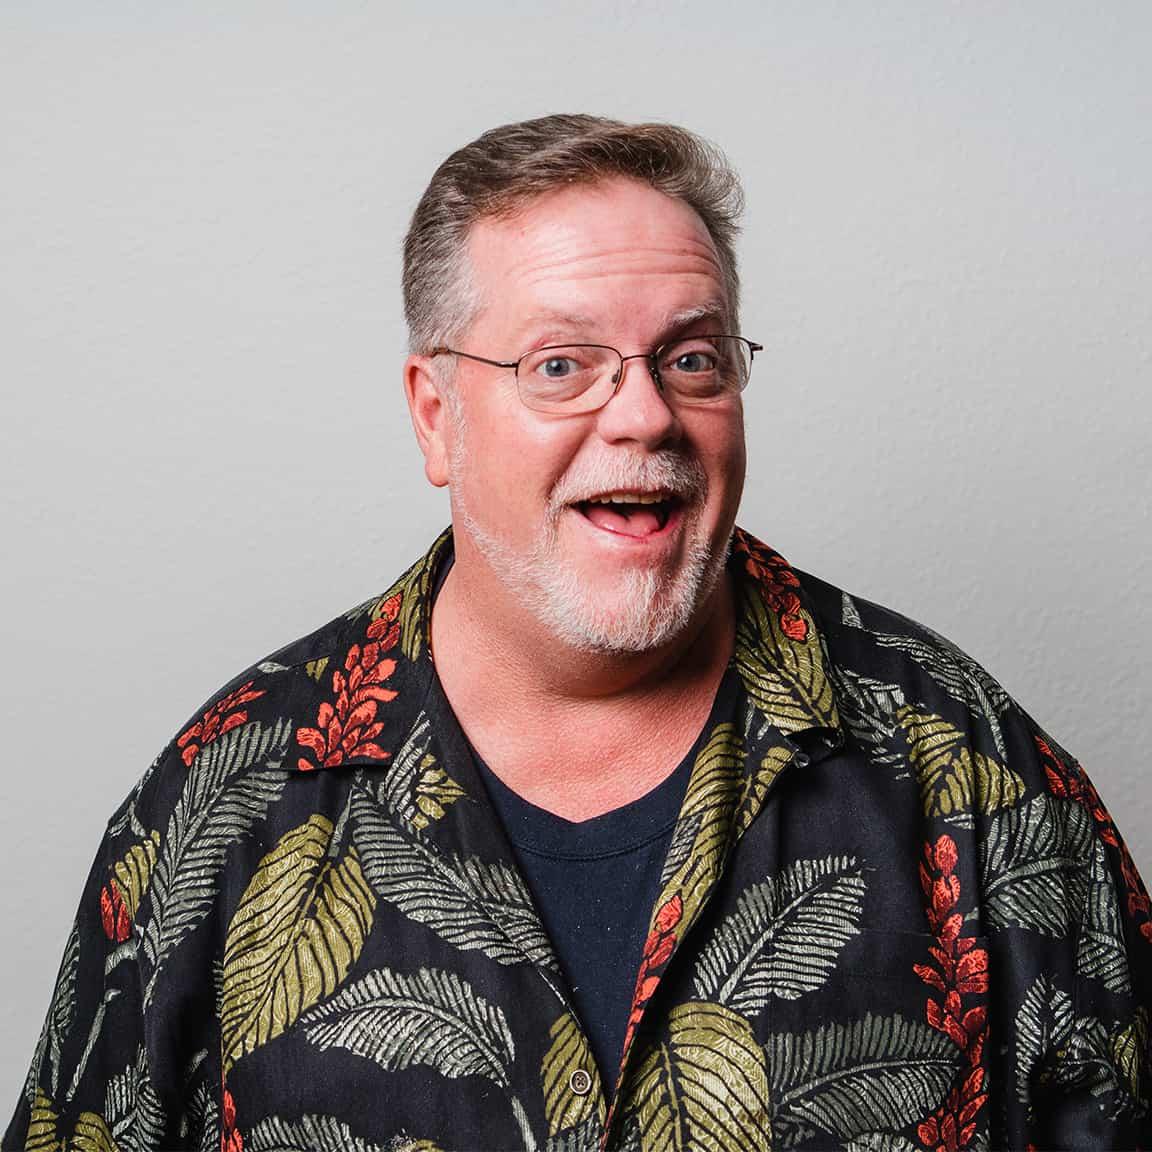 Alan Wickstrom